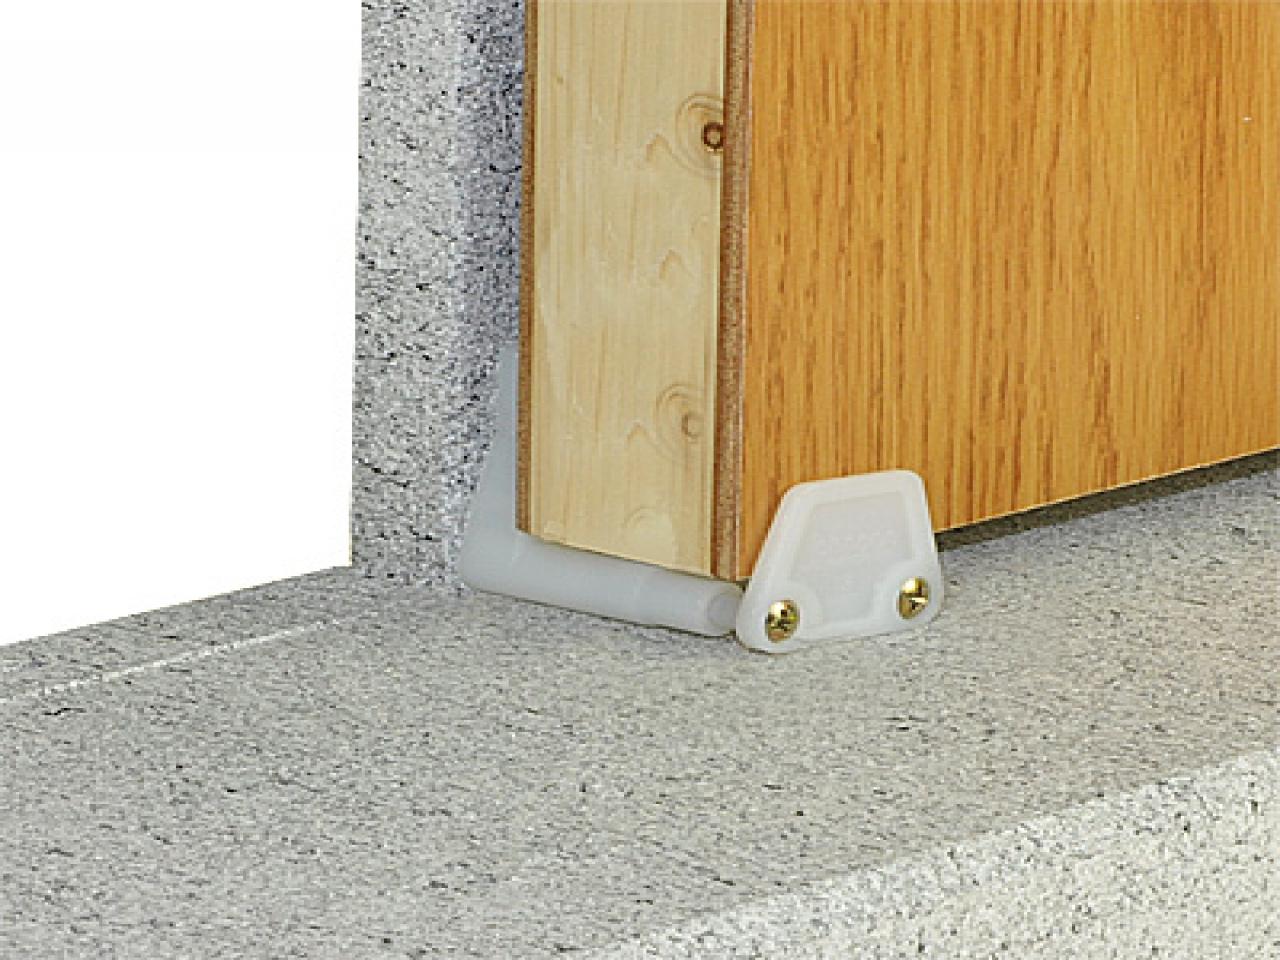 Wall Mounted Sliding Door Guidesliding wall hardware interior sliding barn doors wall mount